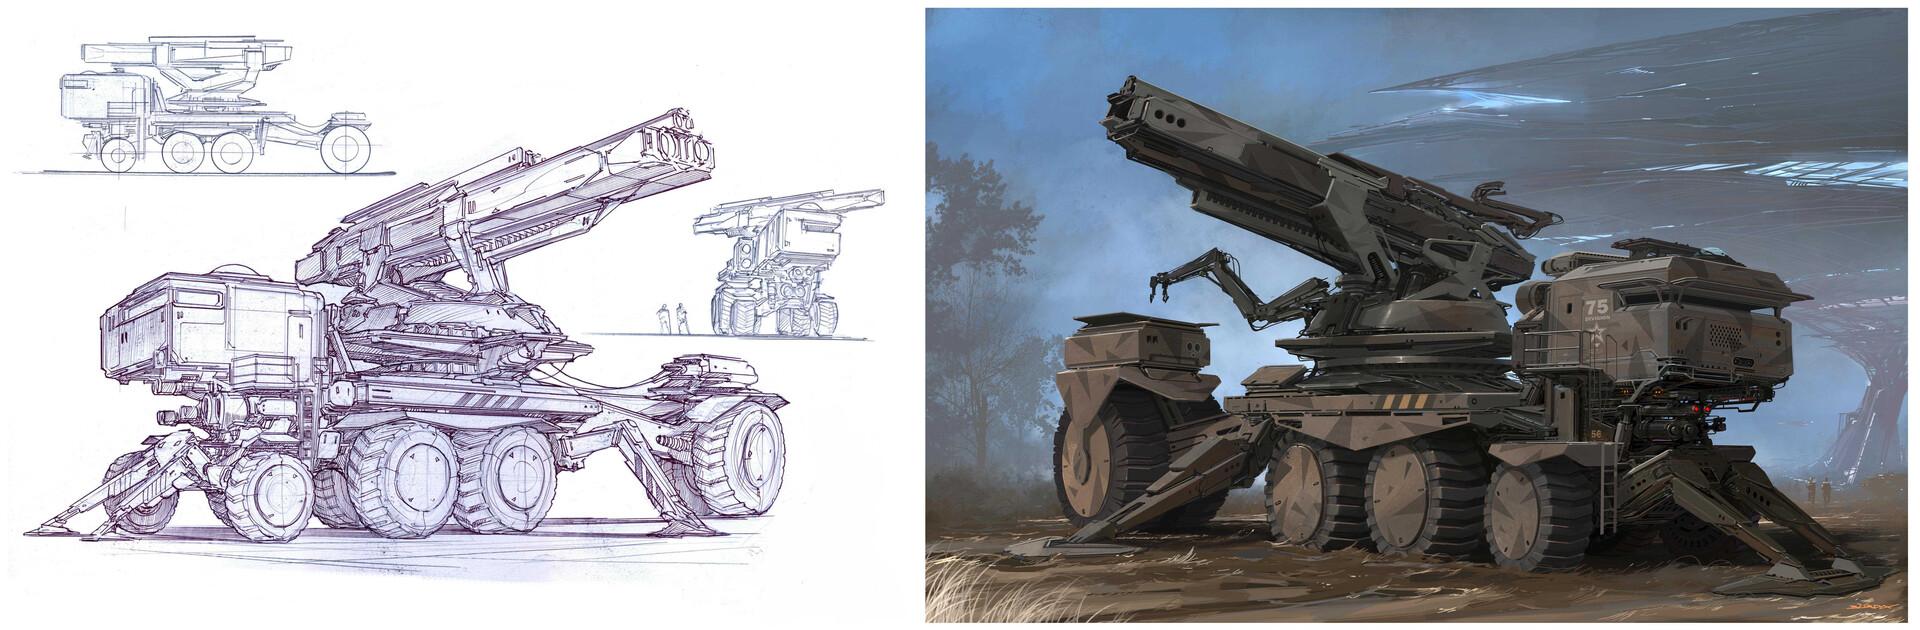 Alejandro burdisio concepts e liustra howitzer artstation